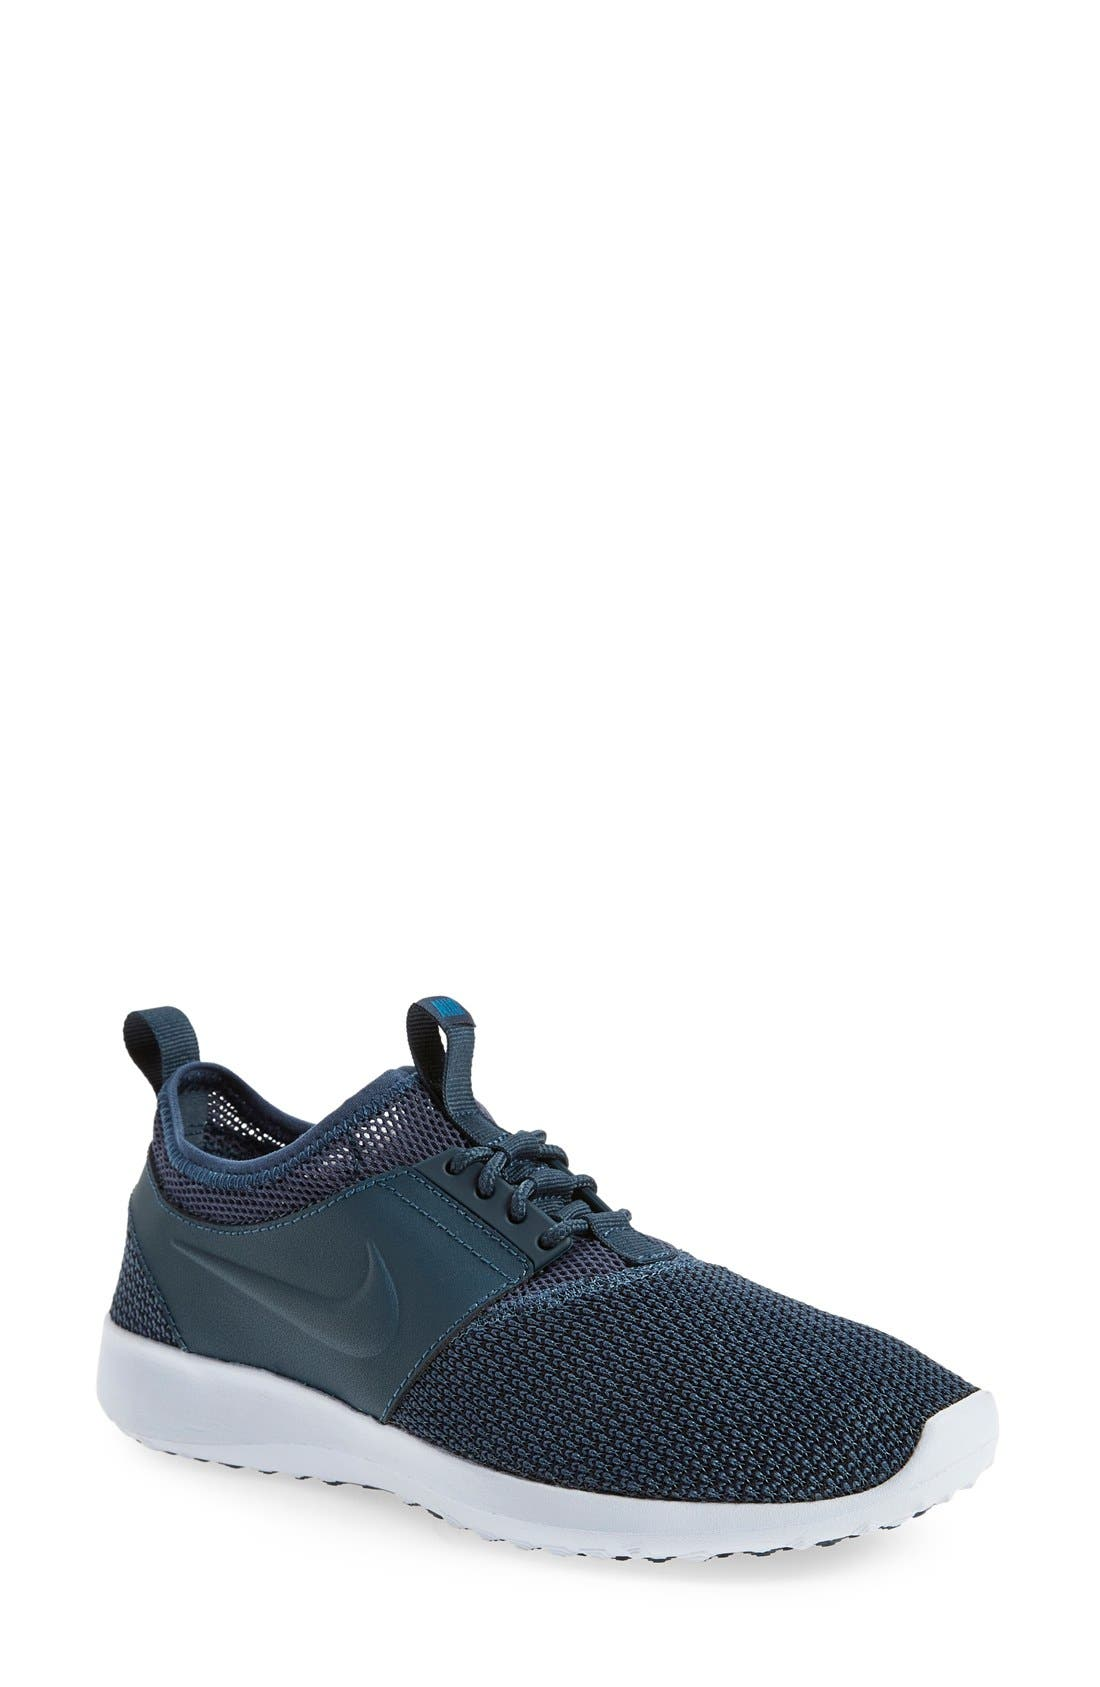 Alternate Image 1 Selected - Nike 'Juvenate TXT'Sneaker (Women)